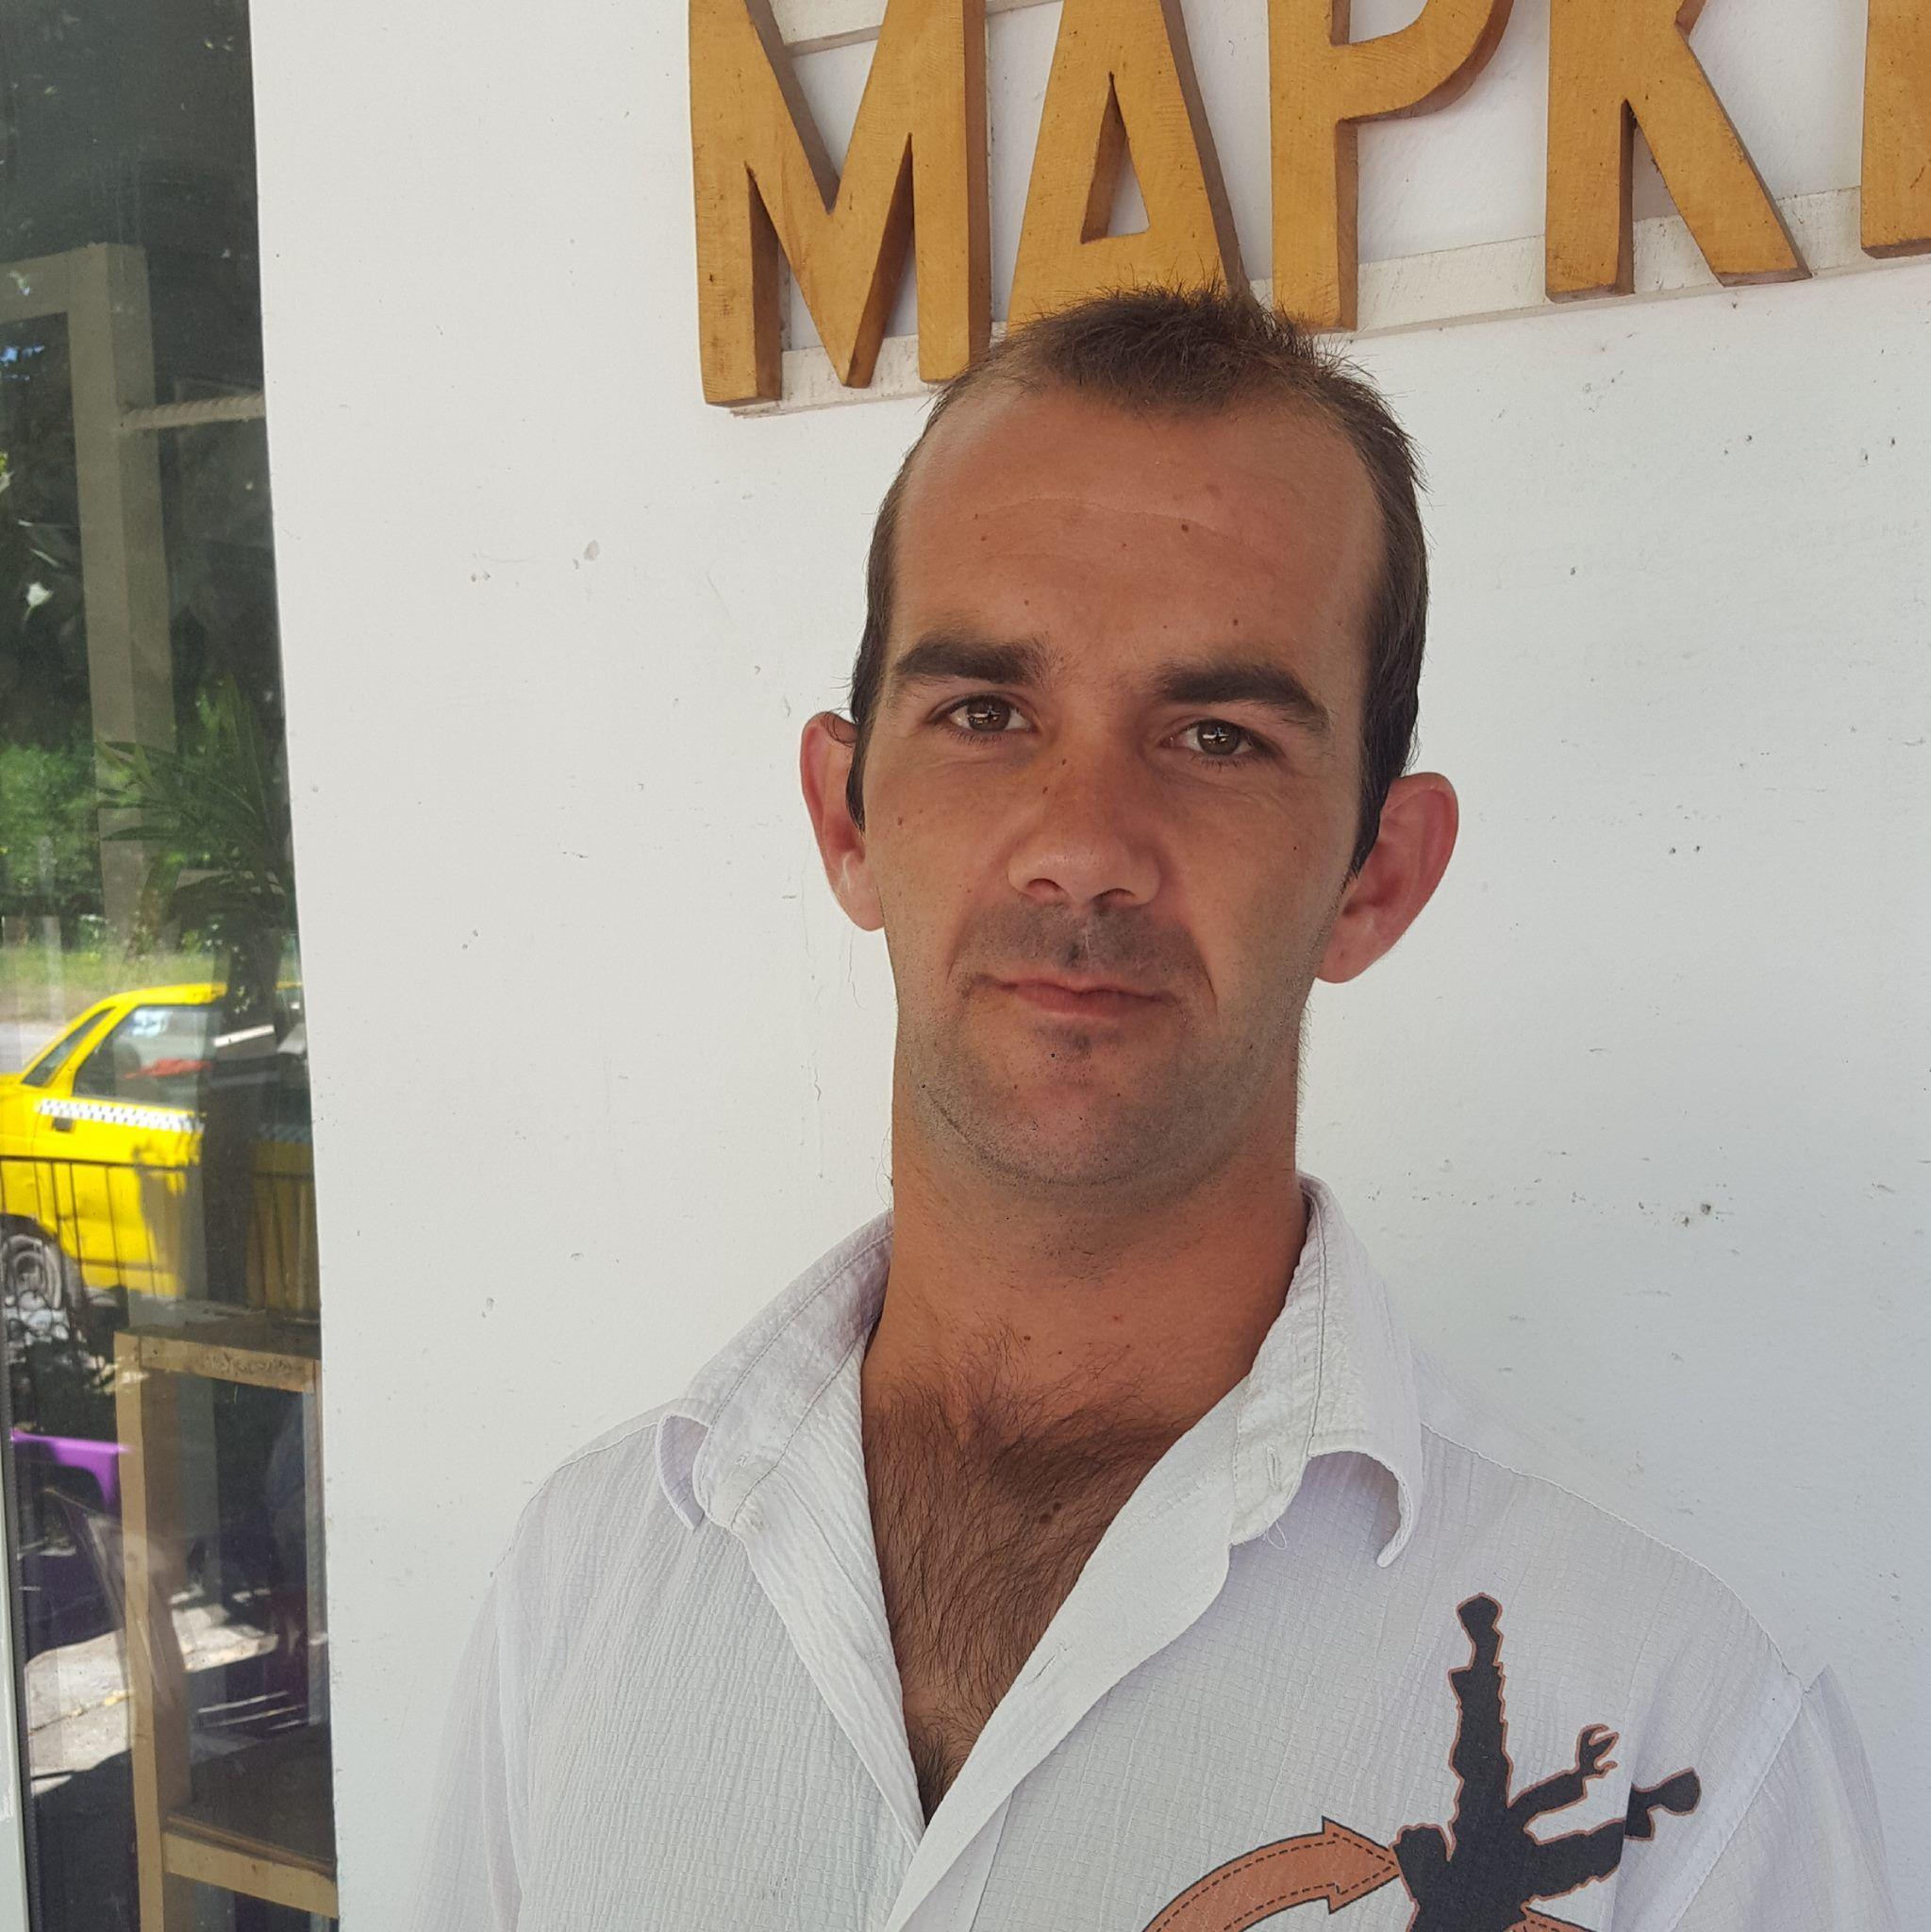 Издирват безследно изчезнал таксиметров шофьор